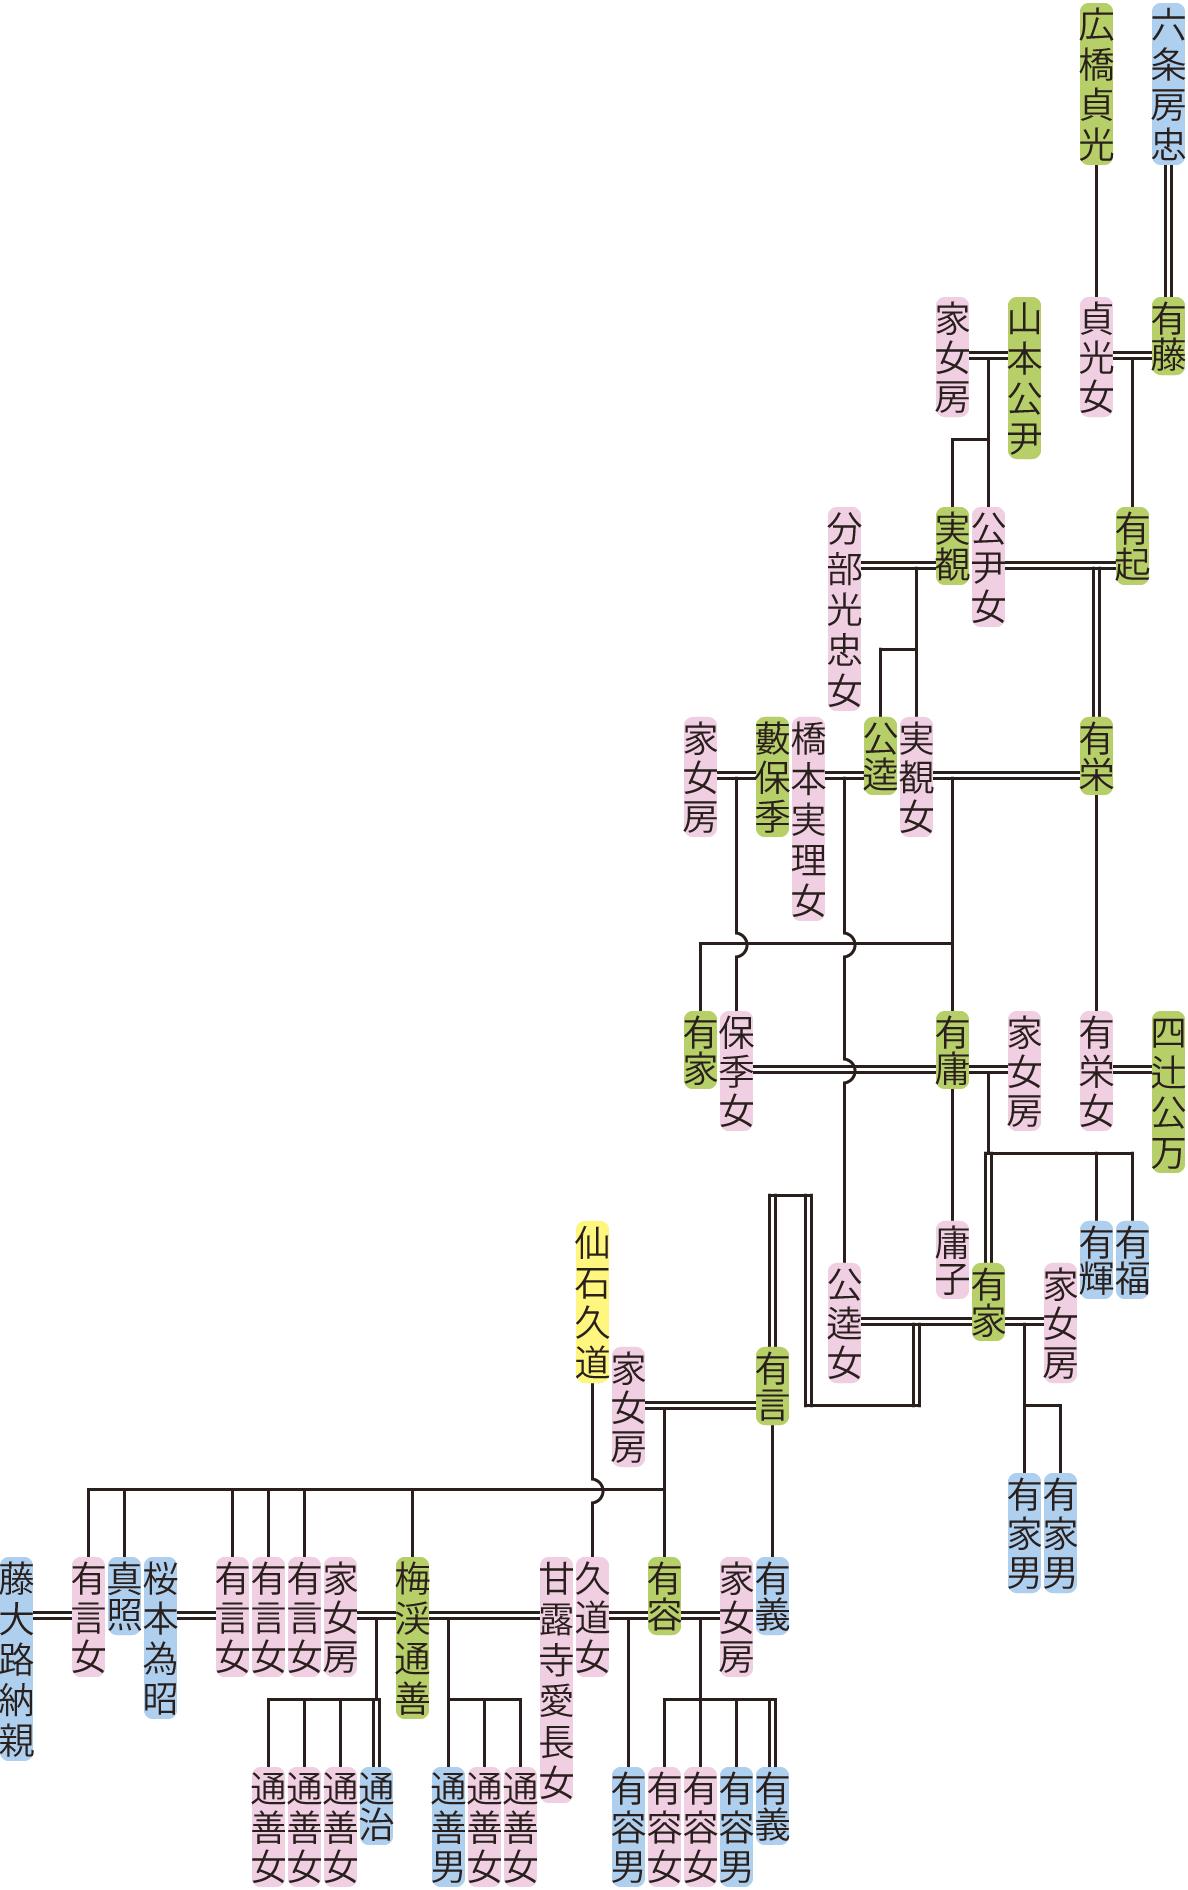 六条有起~有義の系図